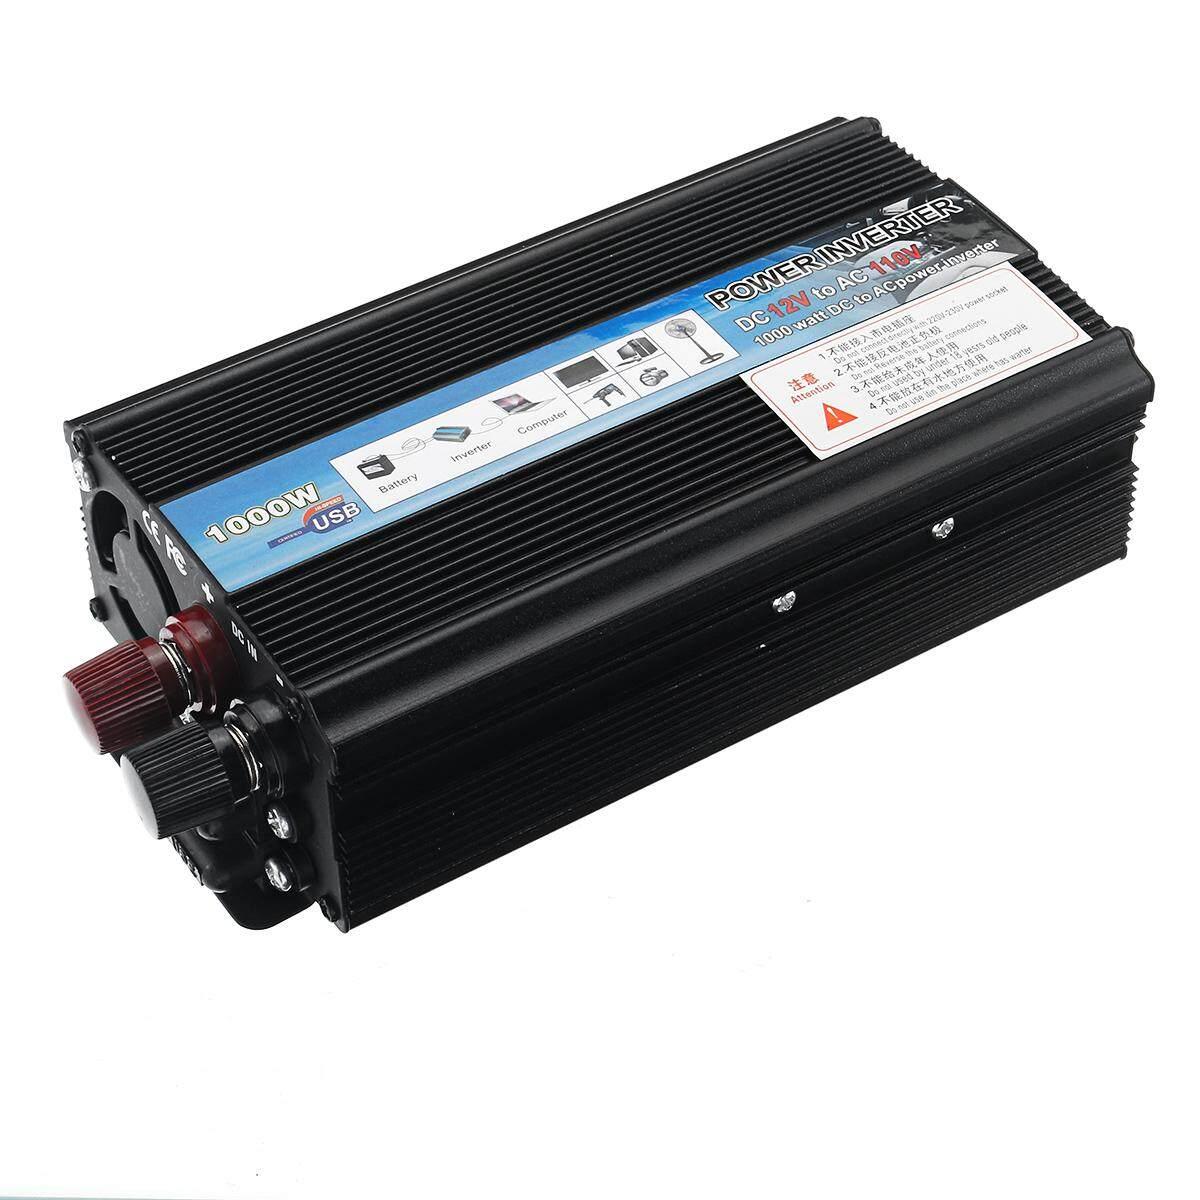 1000W DC 12V to AC 110V 220V Modified Sine Wave Car Power Inverter Converter USB [